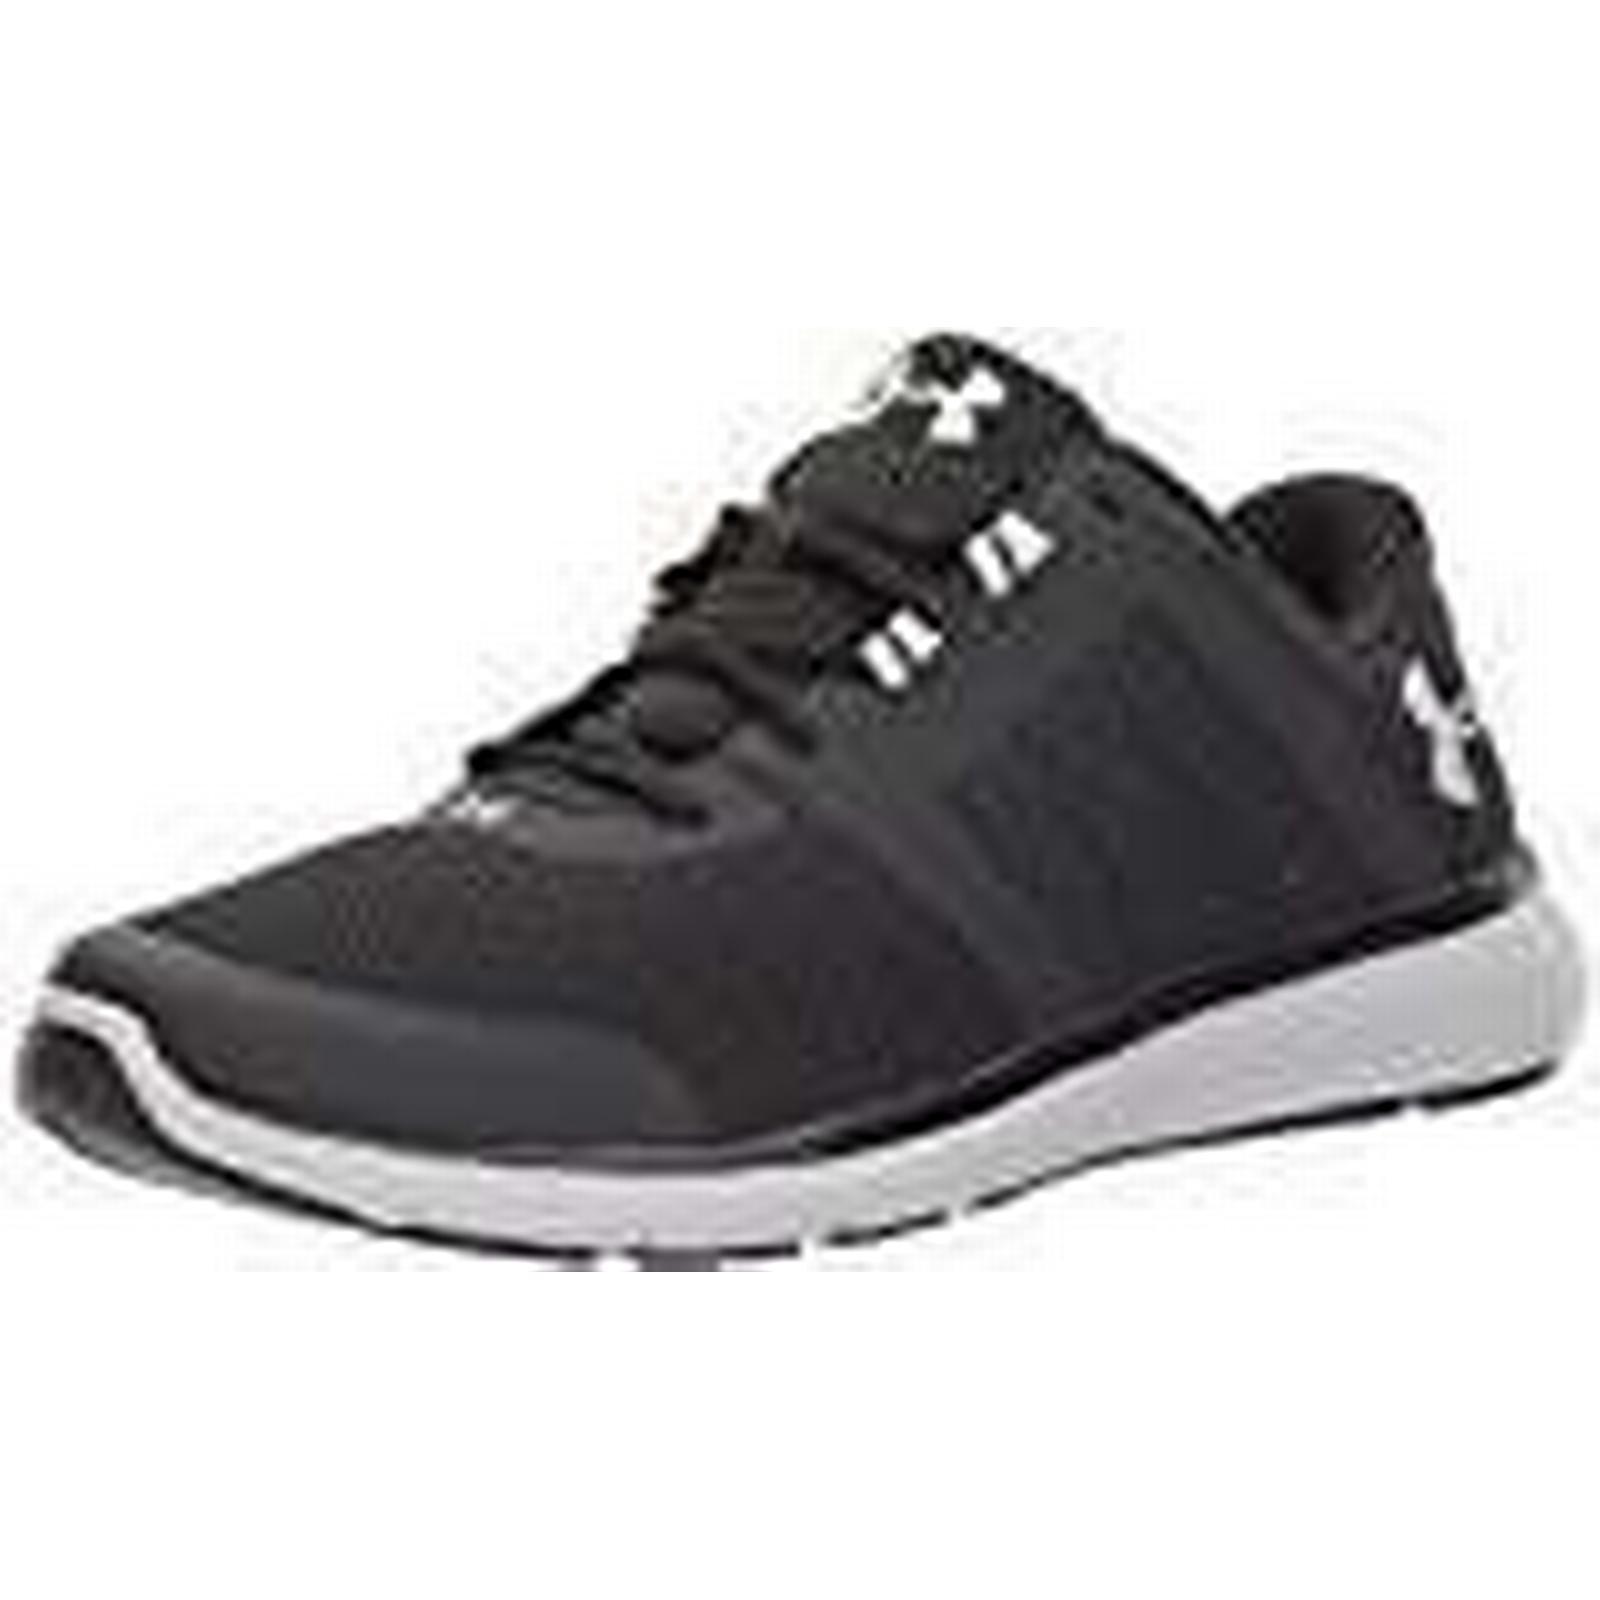 Under Armour Ua Fuse Fst, Men's Competition Running Shoes, UK Black (Black 001), 8 UK Shoes, (42.5 EU) 517e73